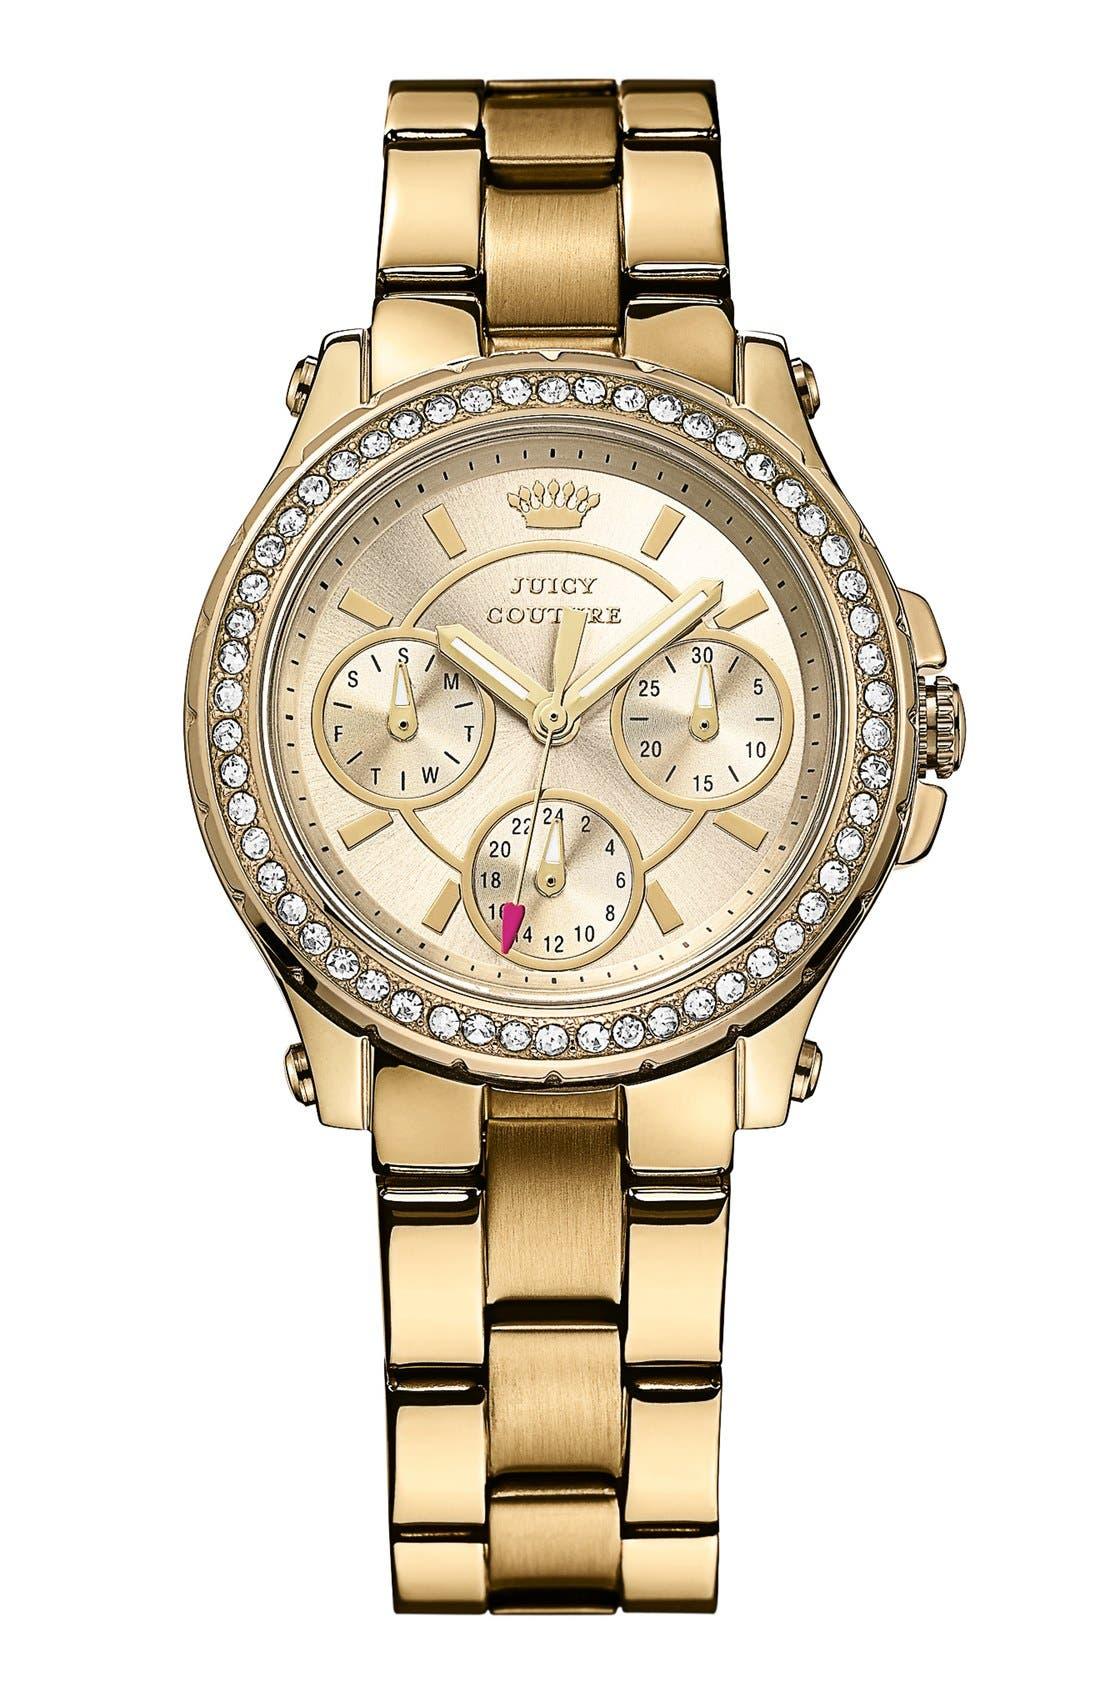 Main Image - Juicy Couture 'Pedigree' Crystal Bezel Bracelet Watch, 32mm